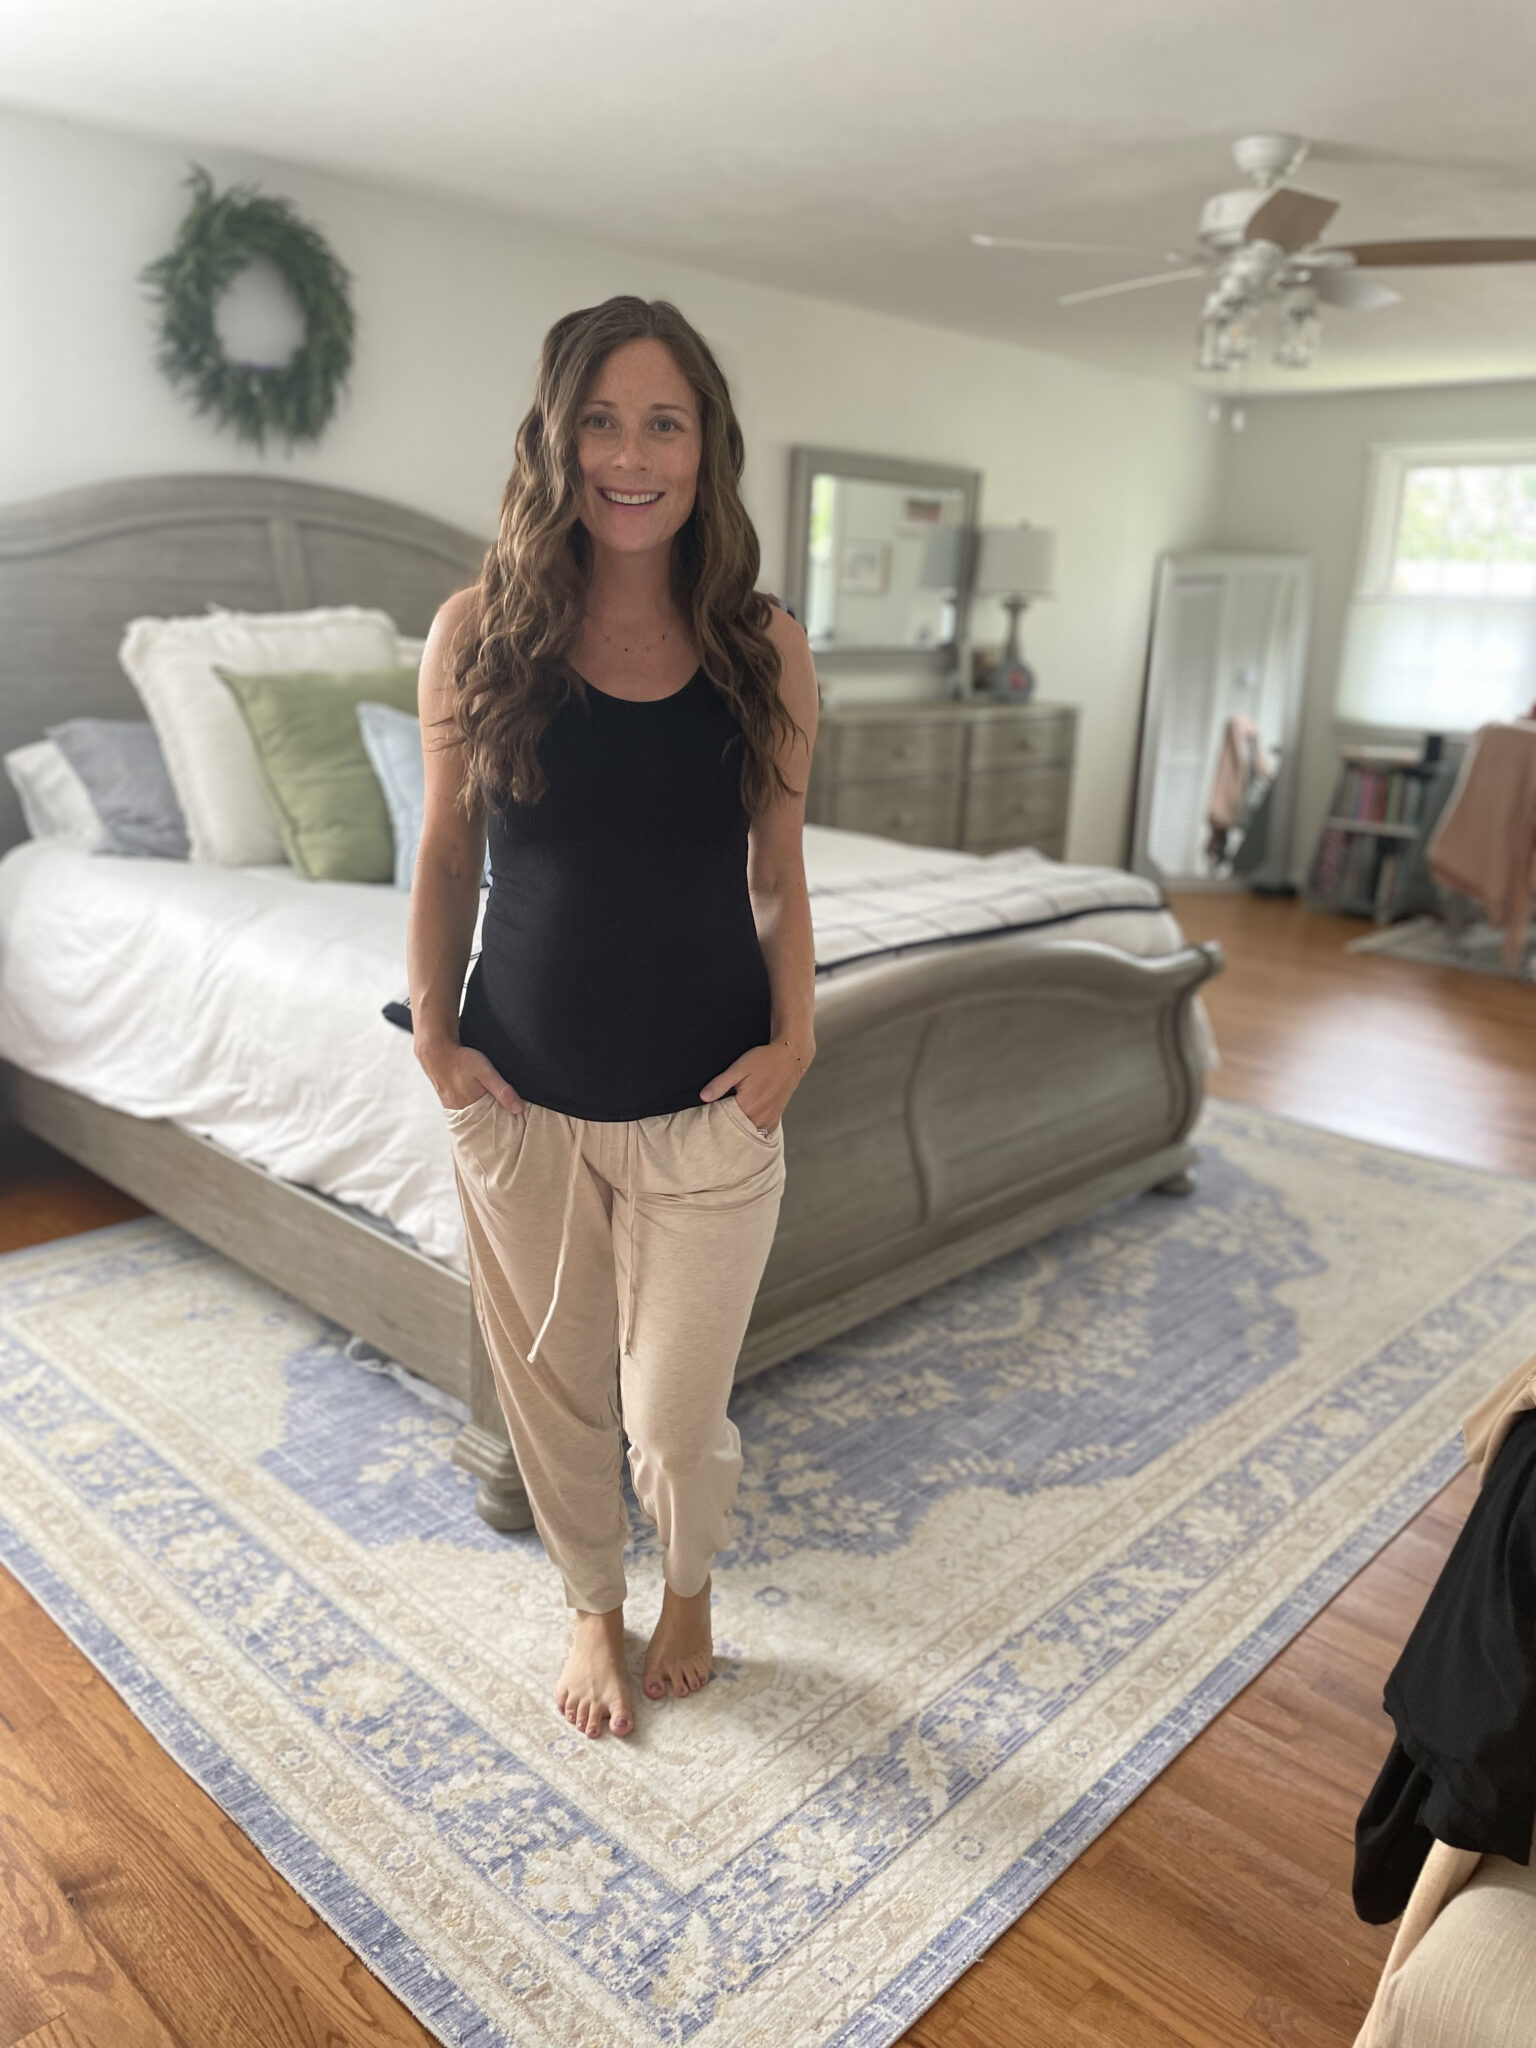 black maternity tank top and tan lounge pants